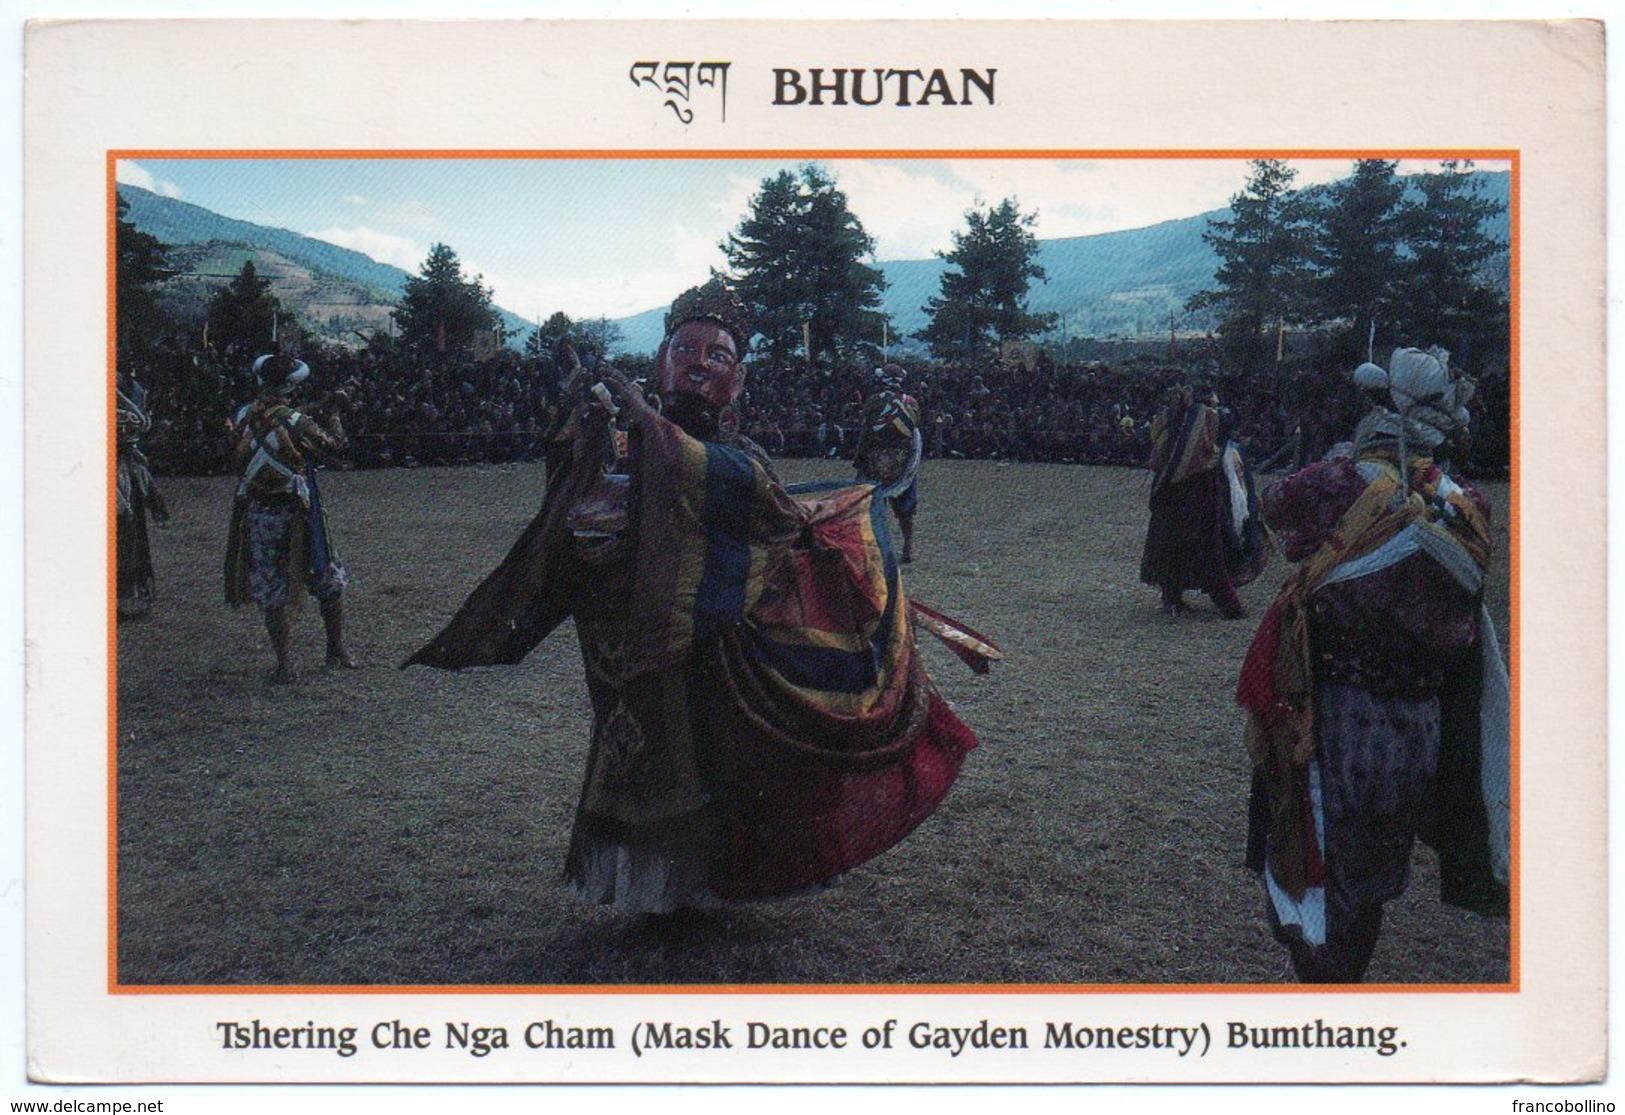 BHUTAN - TSHERING CHE NGA CHAM (MASK DANCE OF GAYDEN MONESTRY) BUMTHANG / THEMATIC STAMPS-FLOWERS - Bhoutan